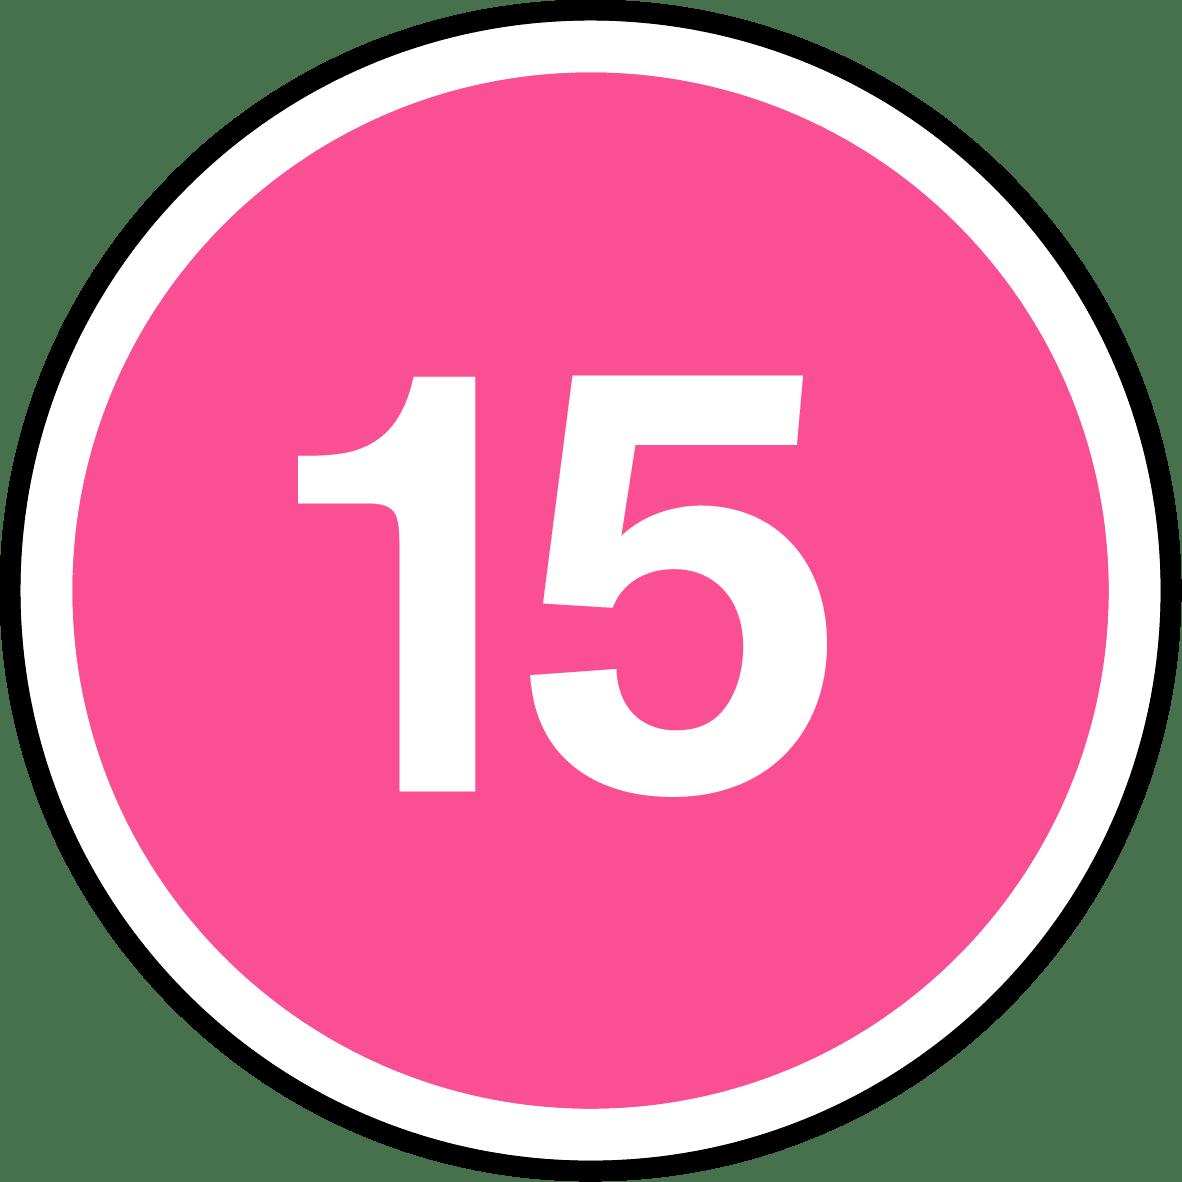 Certfication: 15